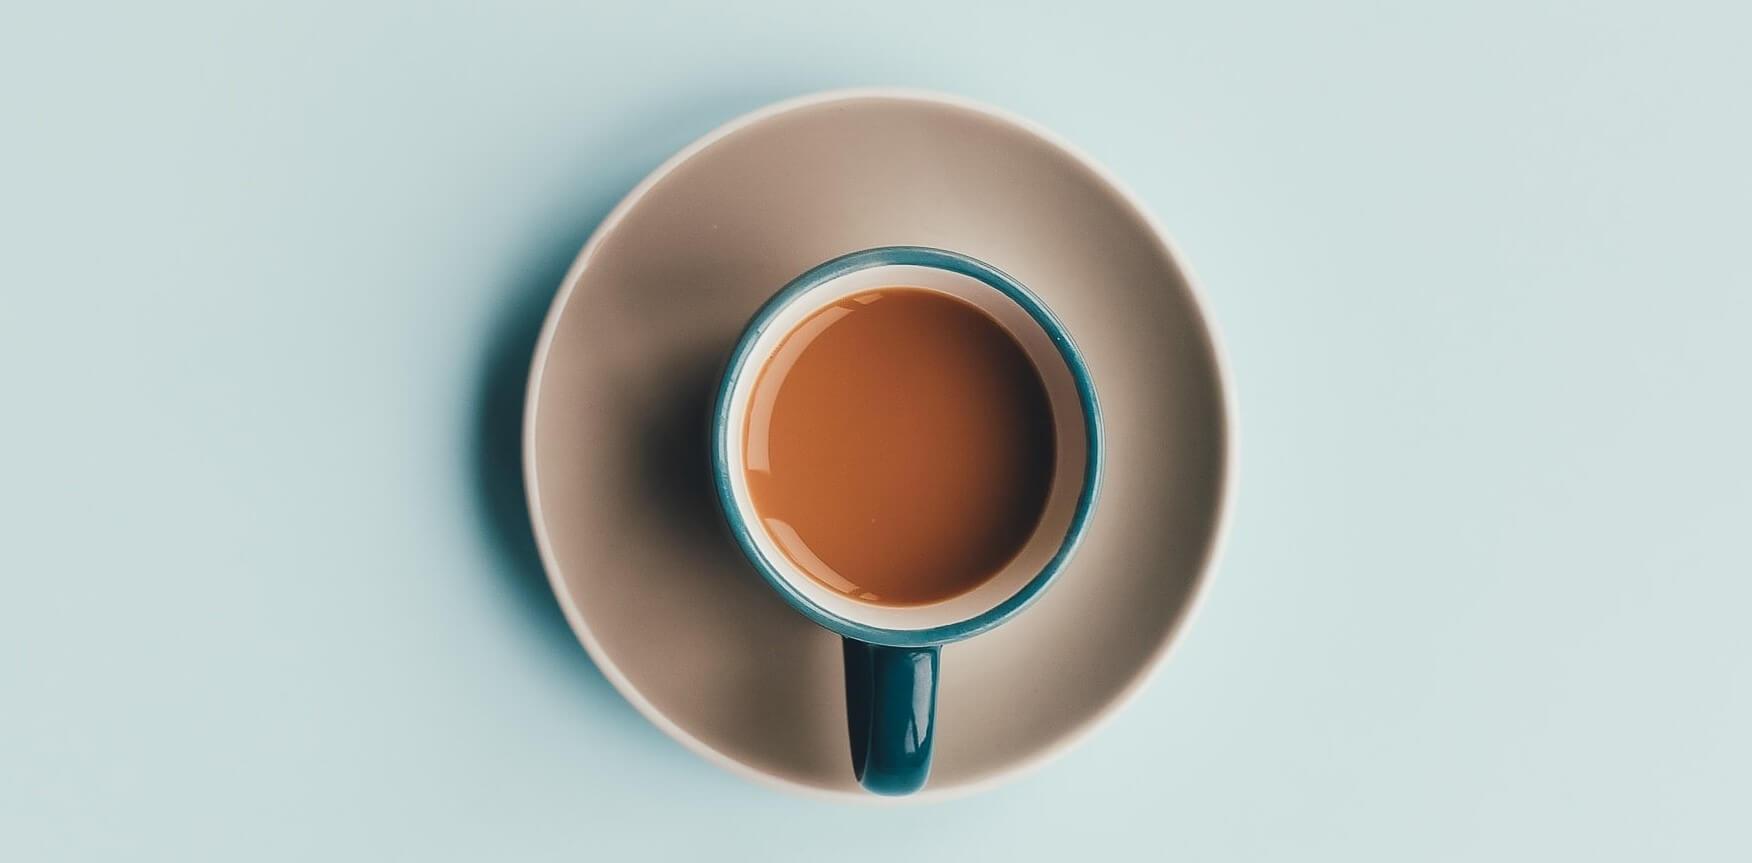 Kaffee auf dem Philips LatteGo